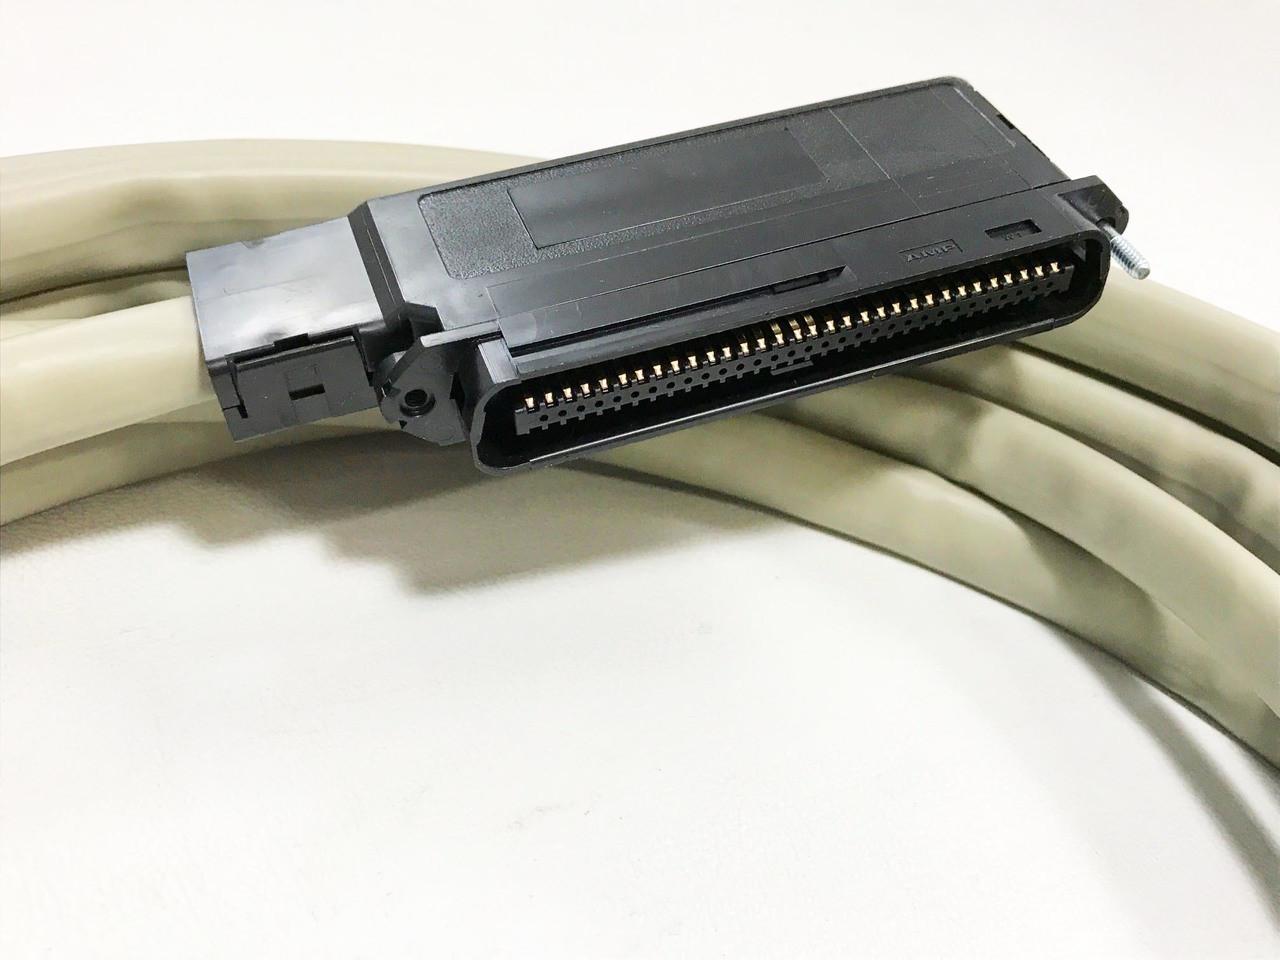 1200287L1 and 1200287L2 - 25' 64-Pin Amphenol to Wire Cable - Equivalent to Adtran 1200287L1